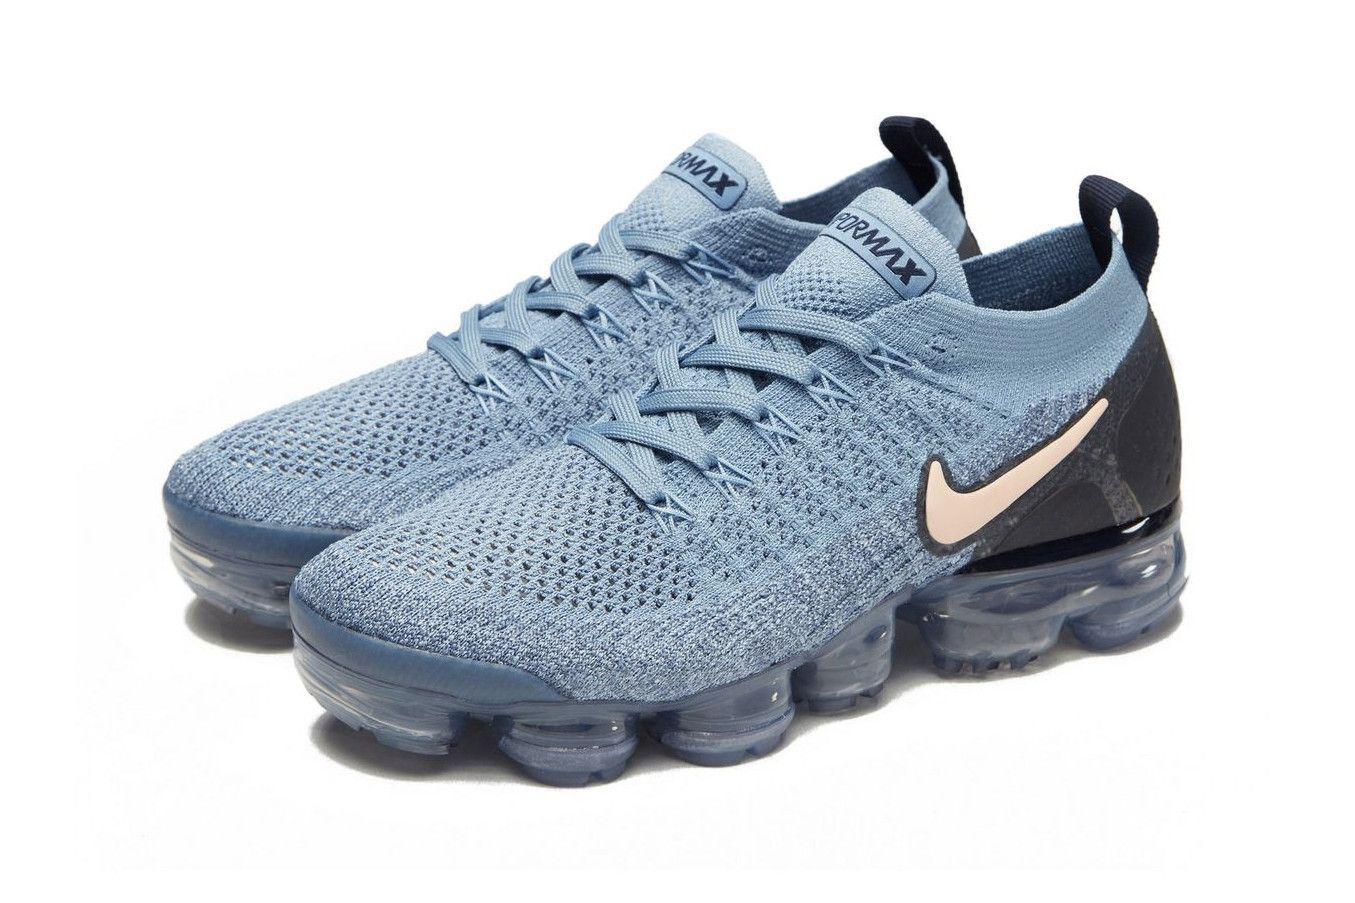 955a1f54d6b84 Nike Drops Air VaporMax Flyknit 2.0 in Baby Blue Light Blue Womens Sneaker   womenssneakers